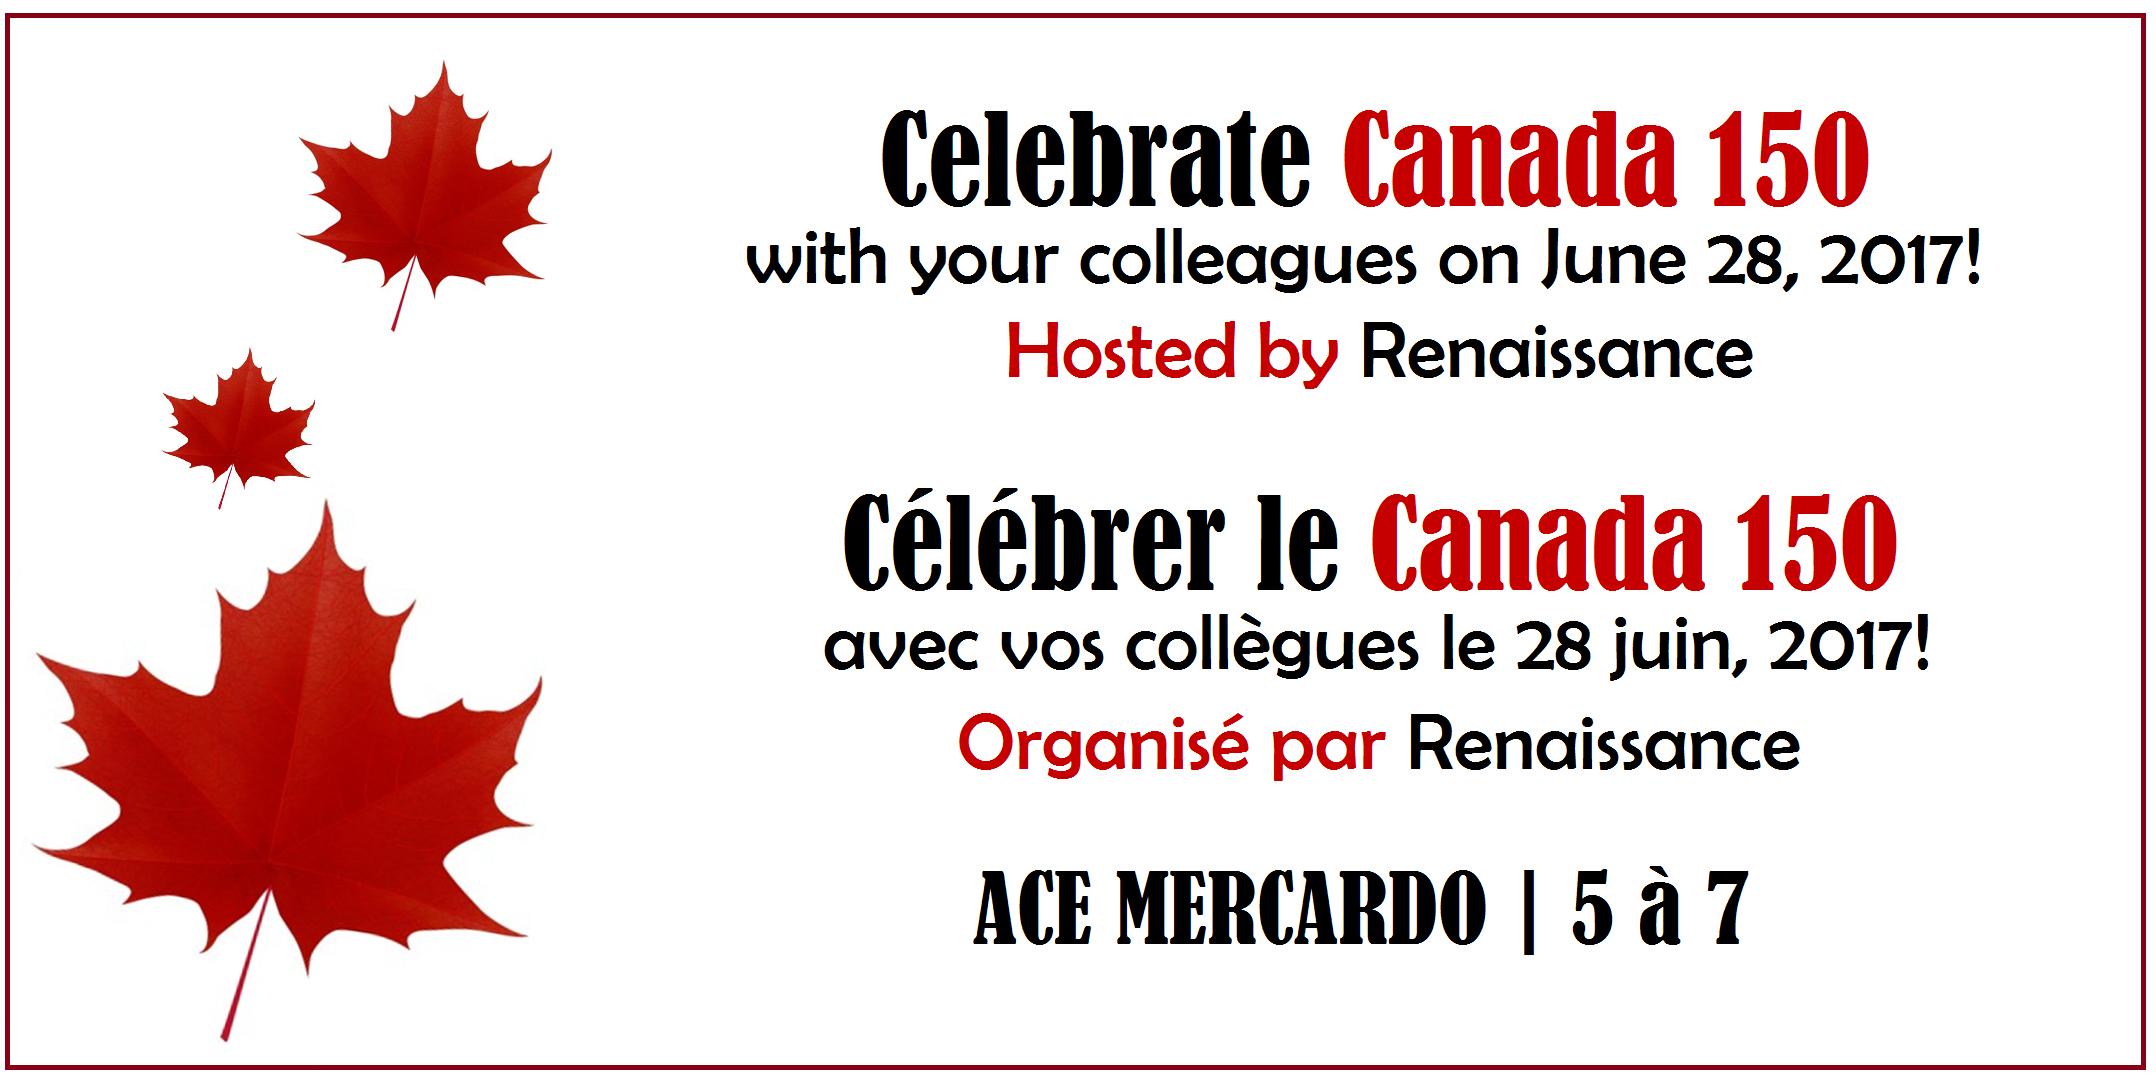 Celebrate Canada 150 | Célébrer le Canada 150